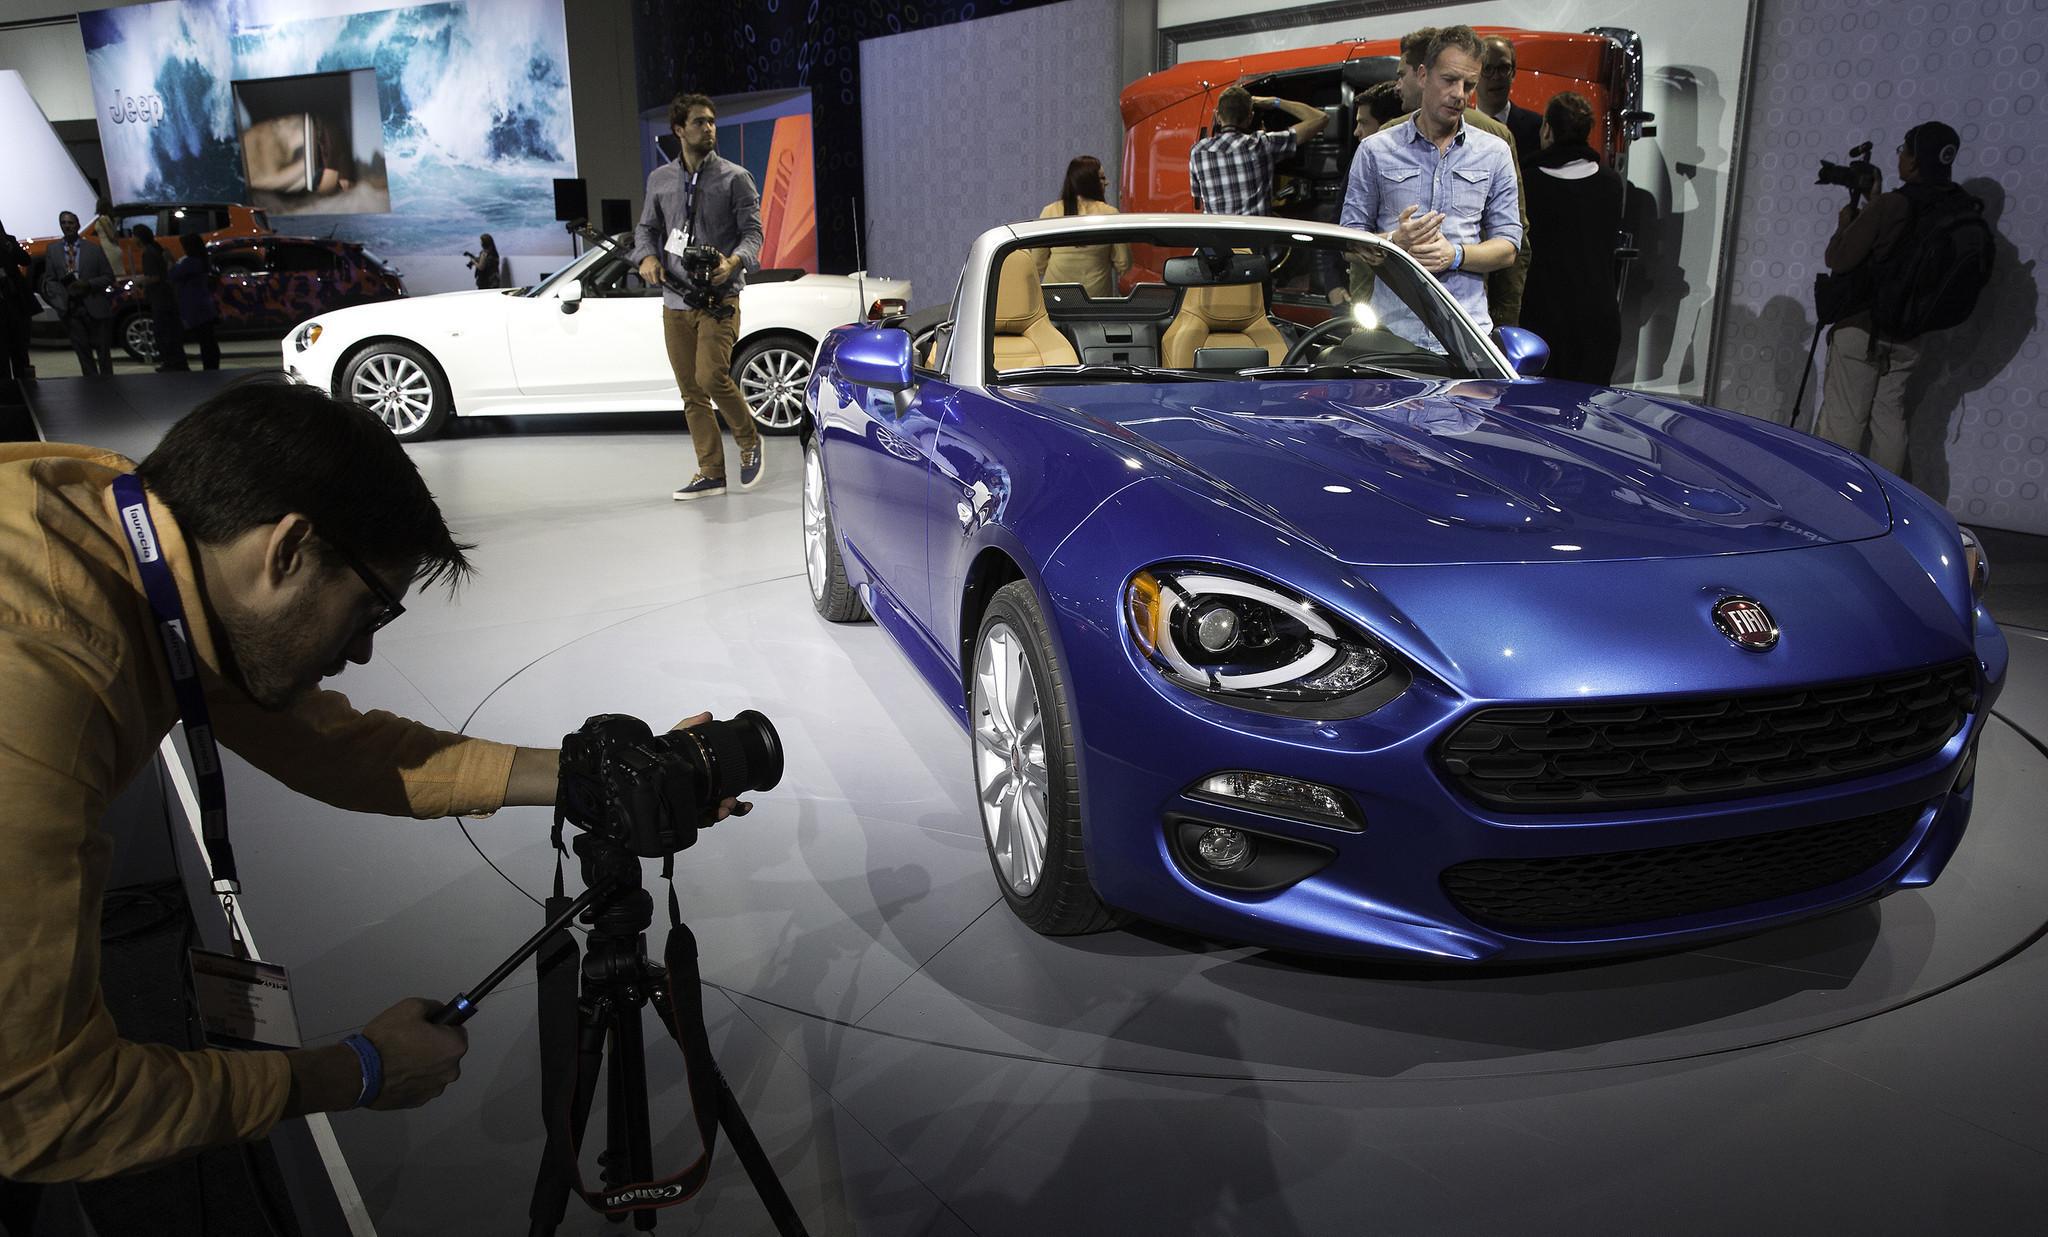 Worksheet. LA Auto Show 2015 Fiat Chryslers ambitious new cars raise